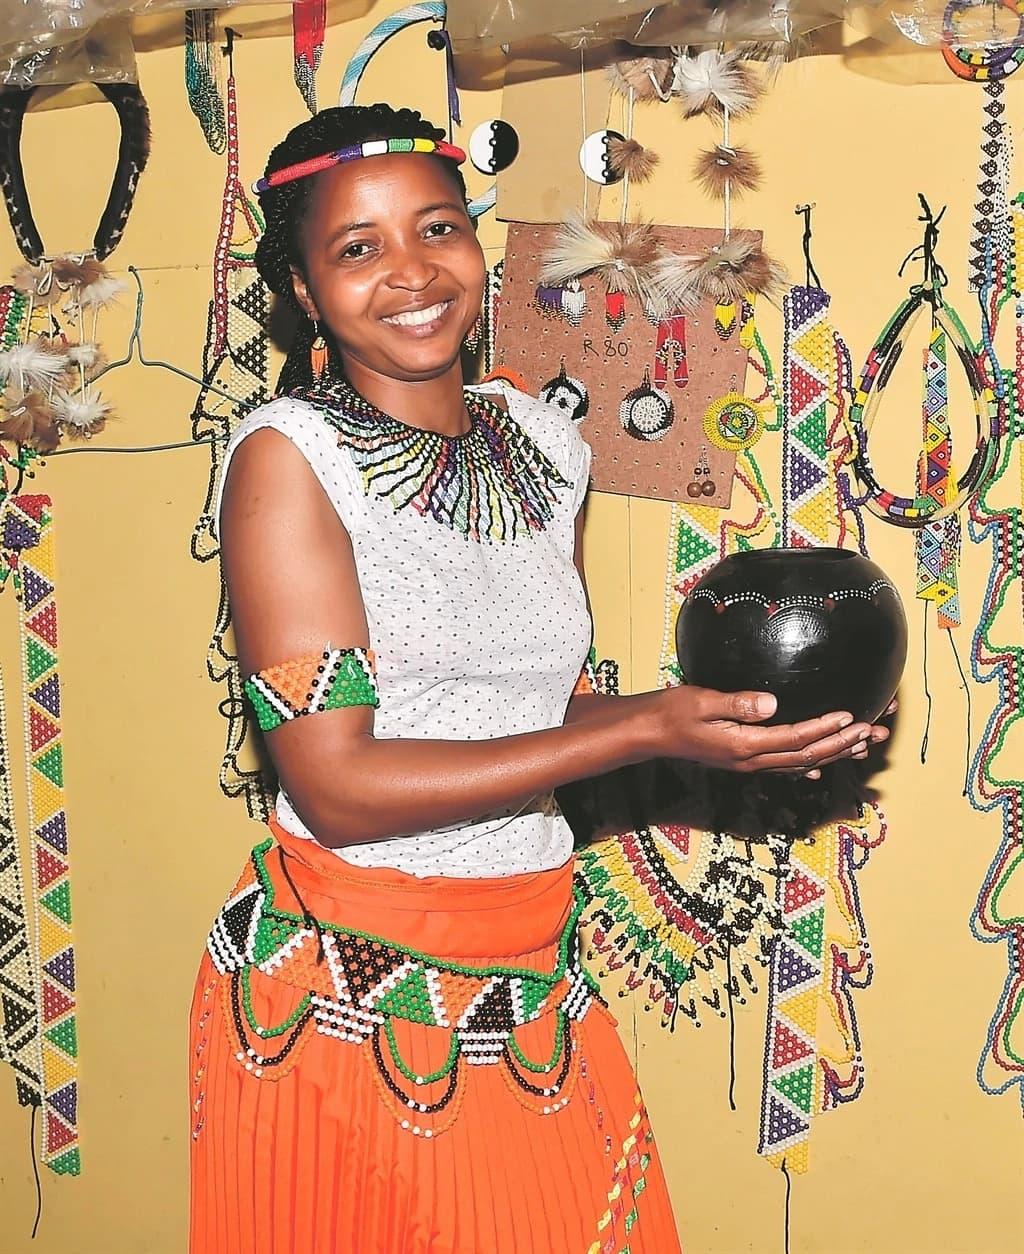 Ncengekile Mhlongo keeps Zulu tradition alive through her amazing beadwork. Source: Daily Sun